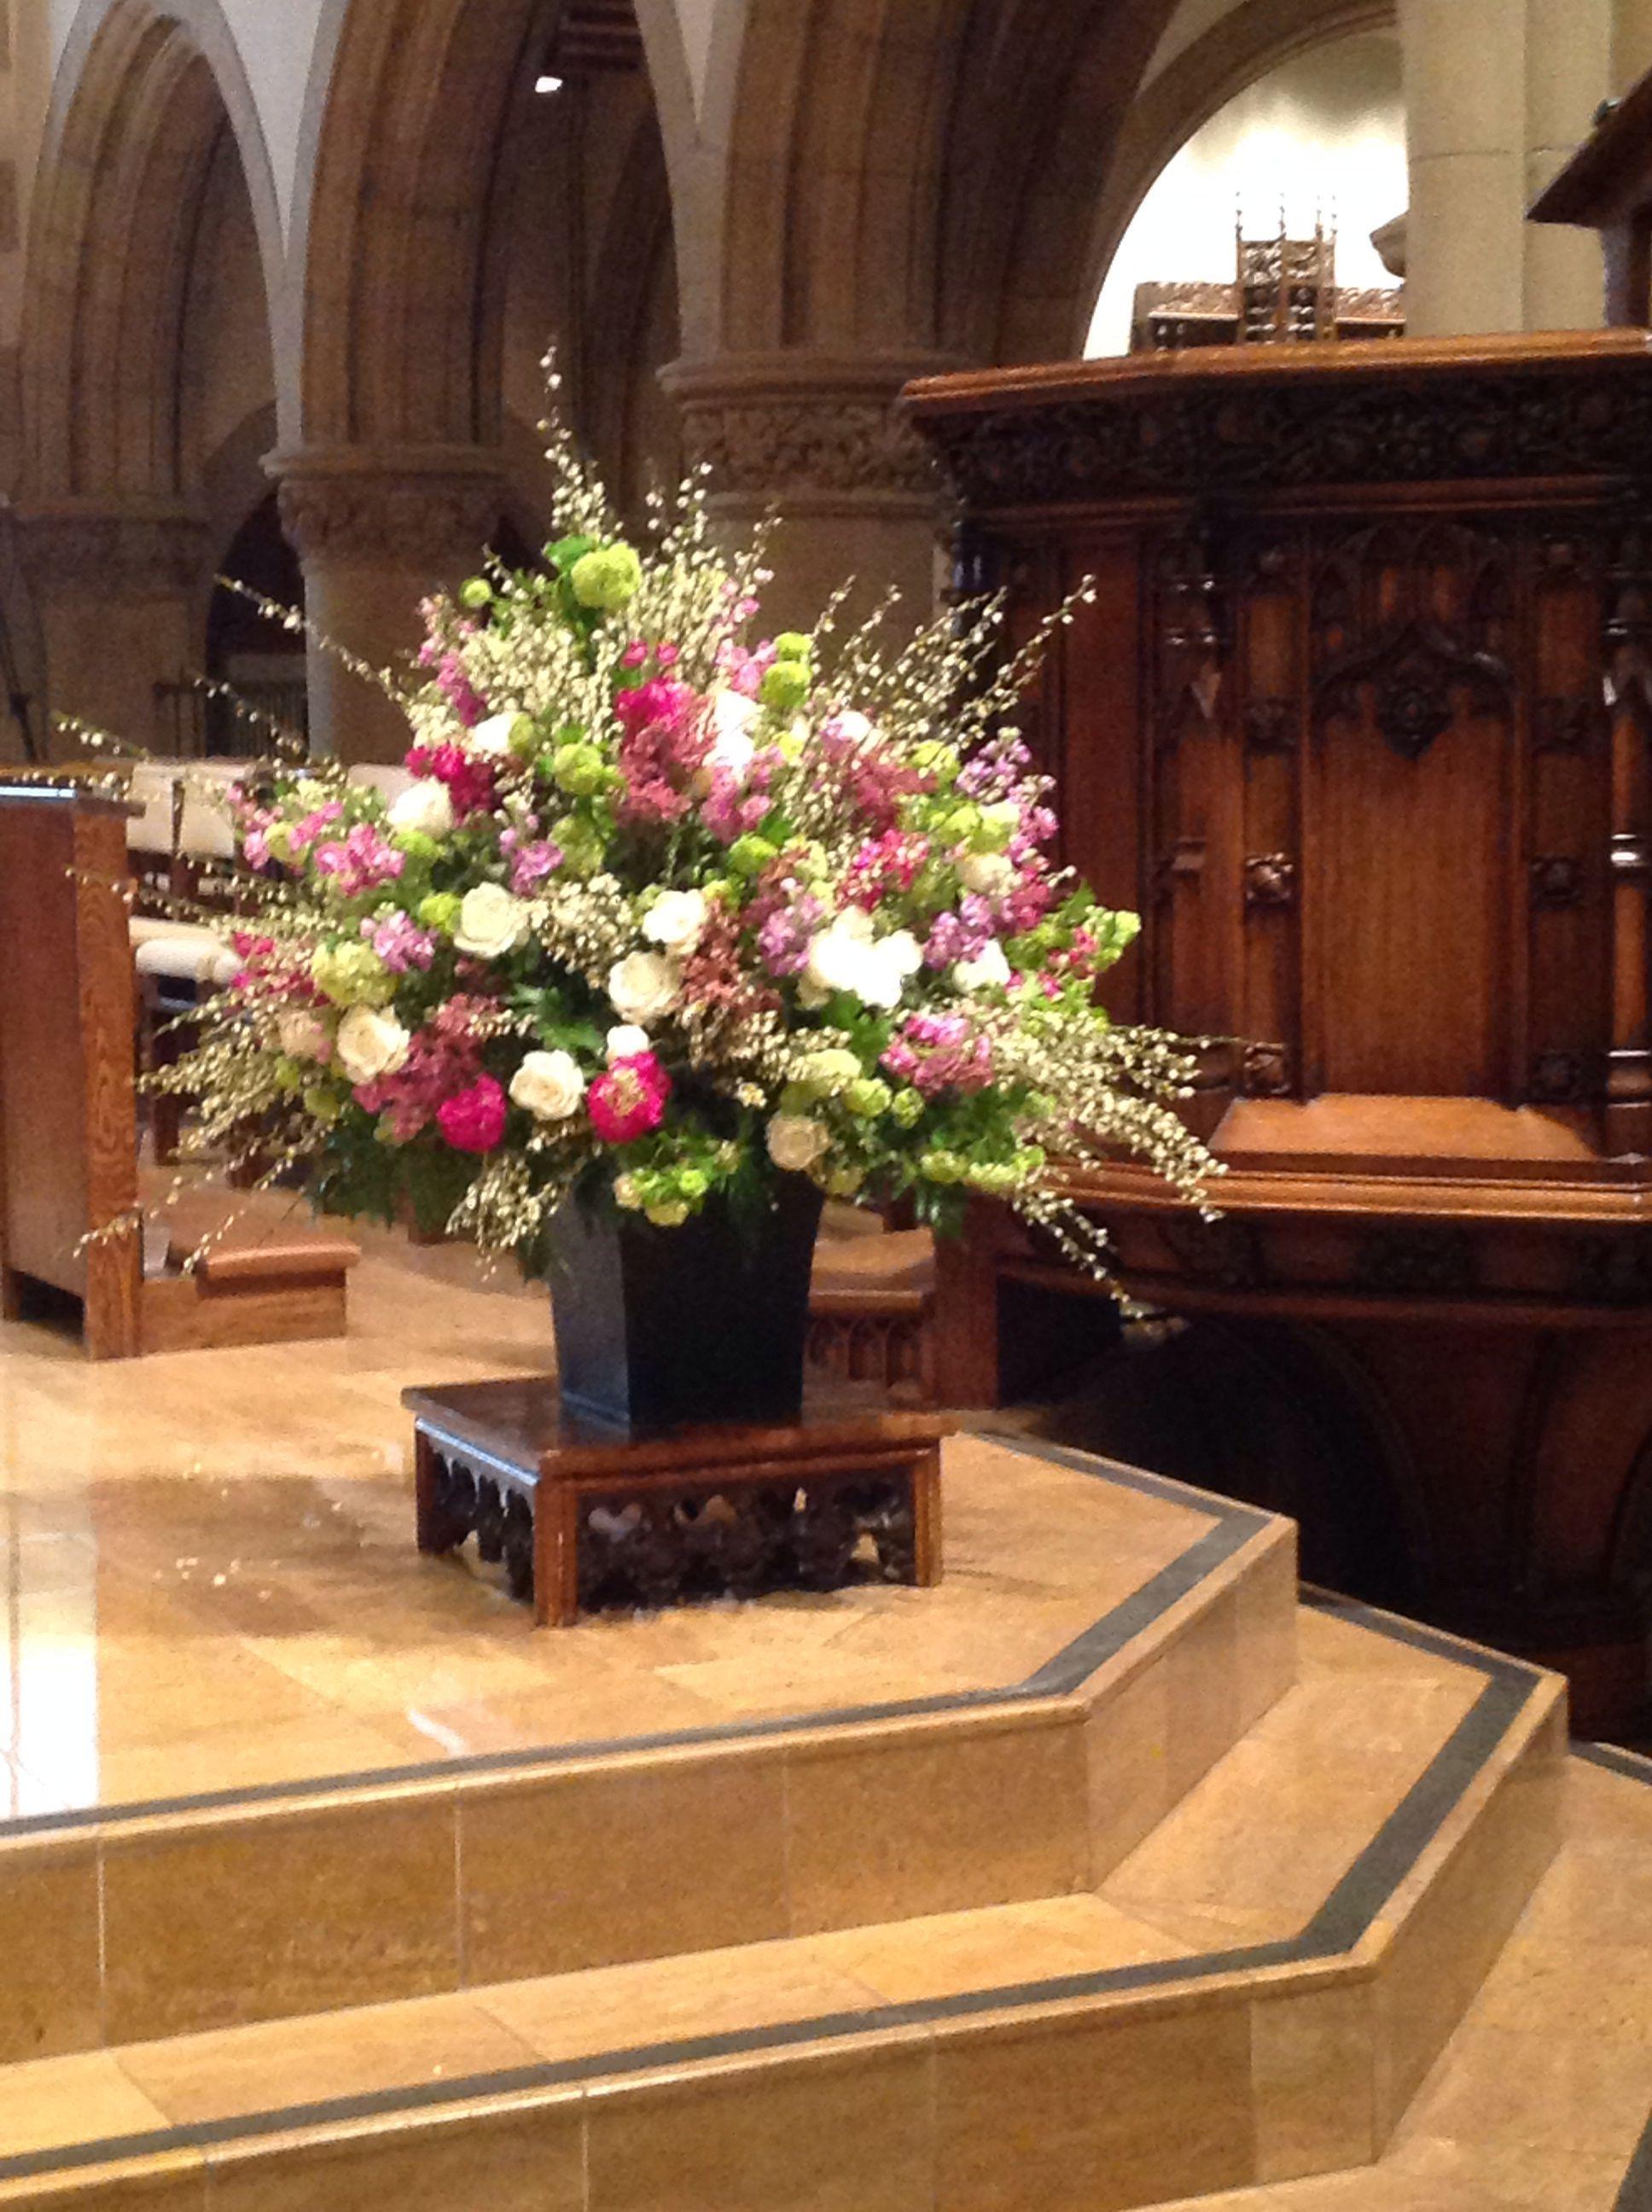 Pin By Karen Vail Smith On Church Flowers All Saints Pasadena Church Decor Altar Arrangement Mothers Day Decor